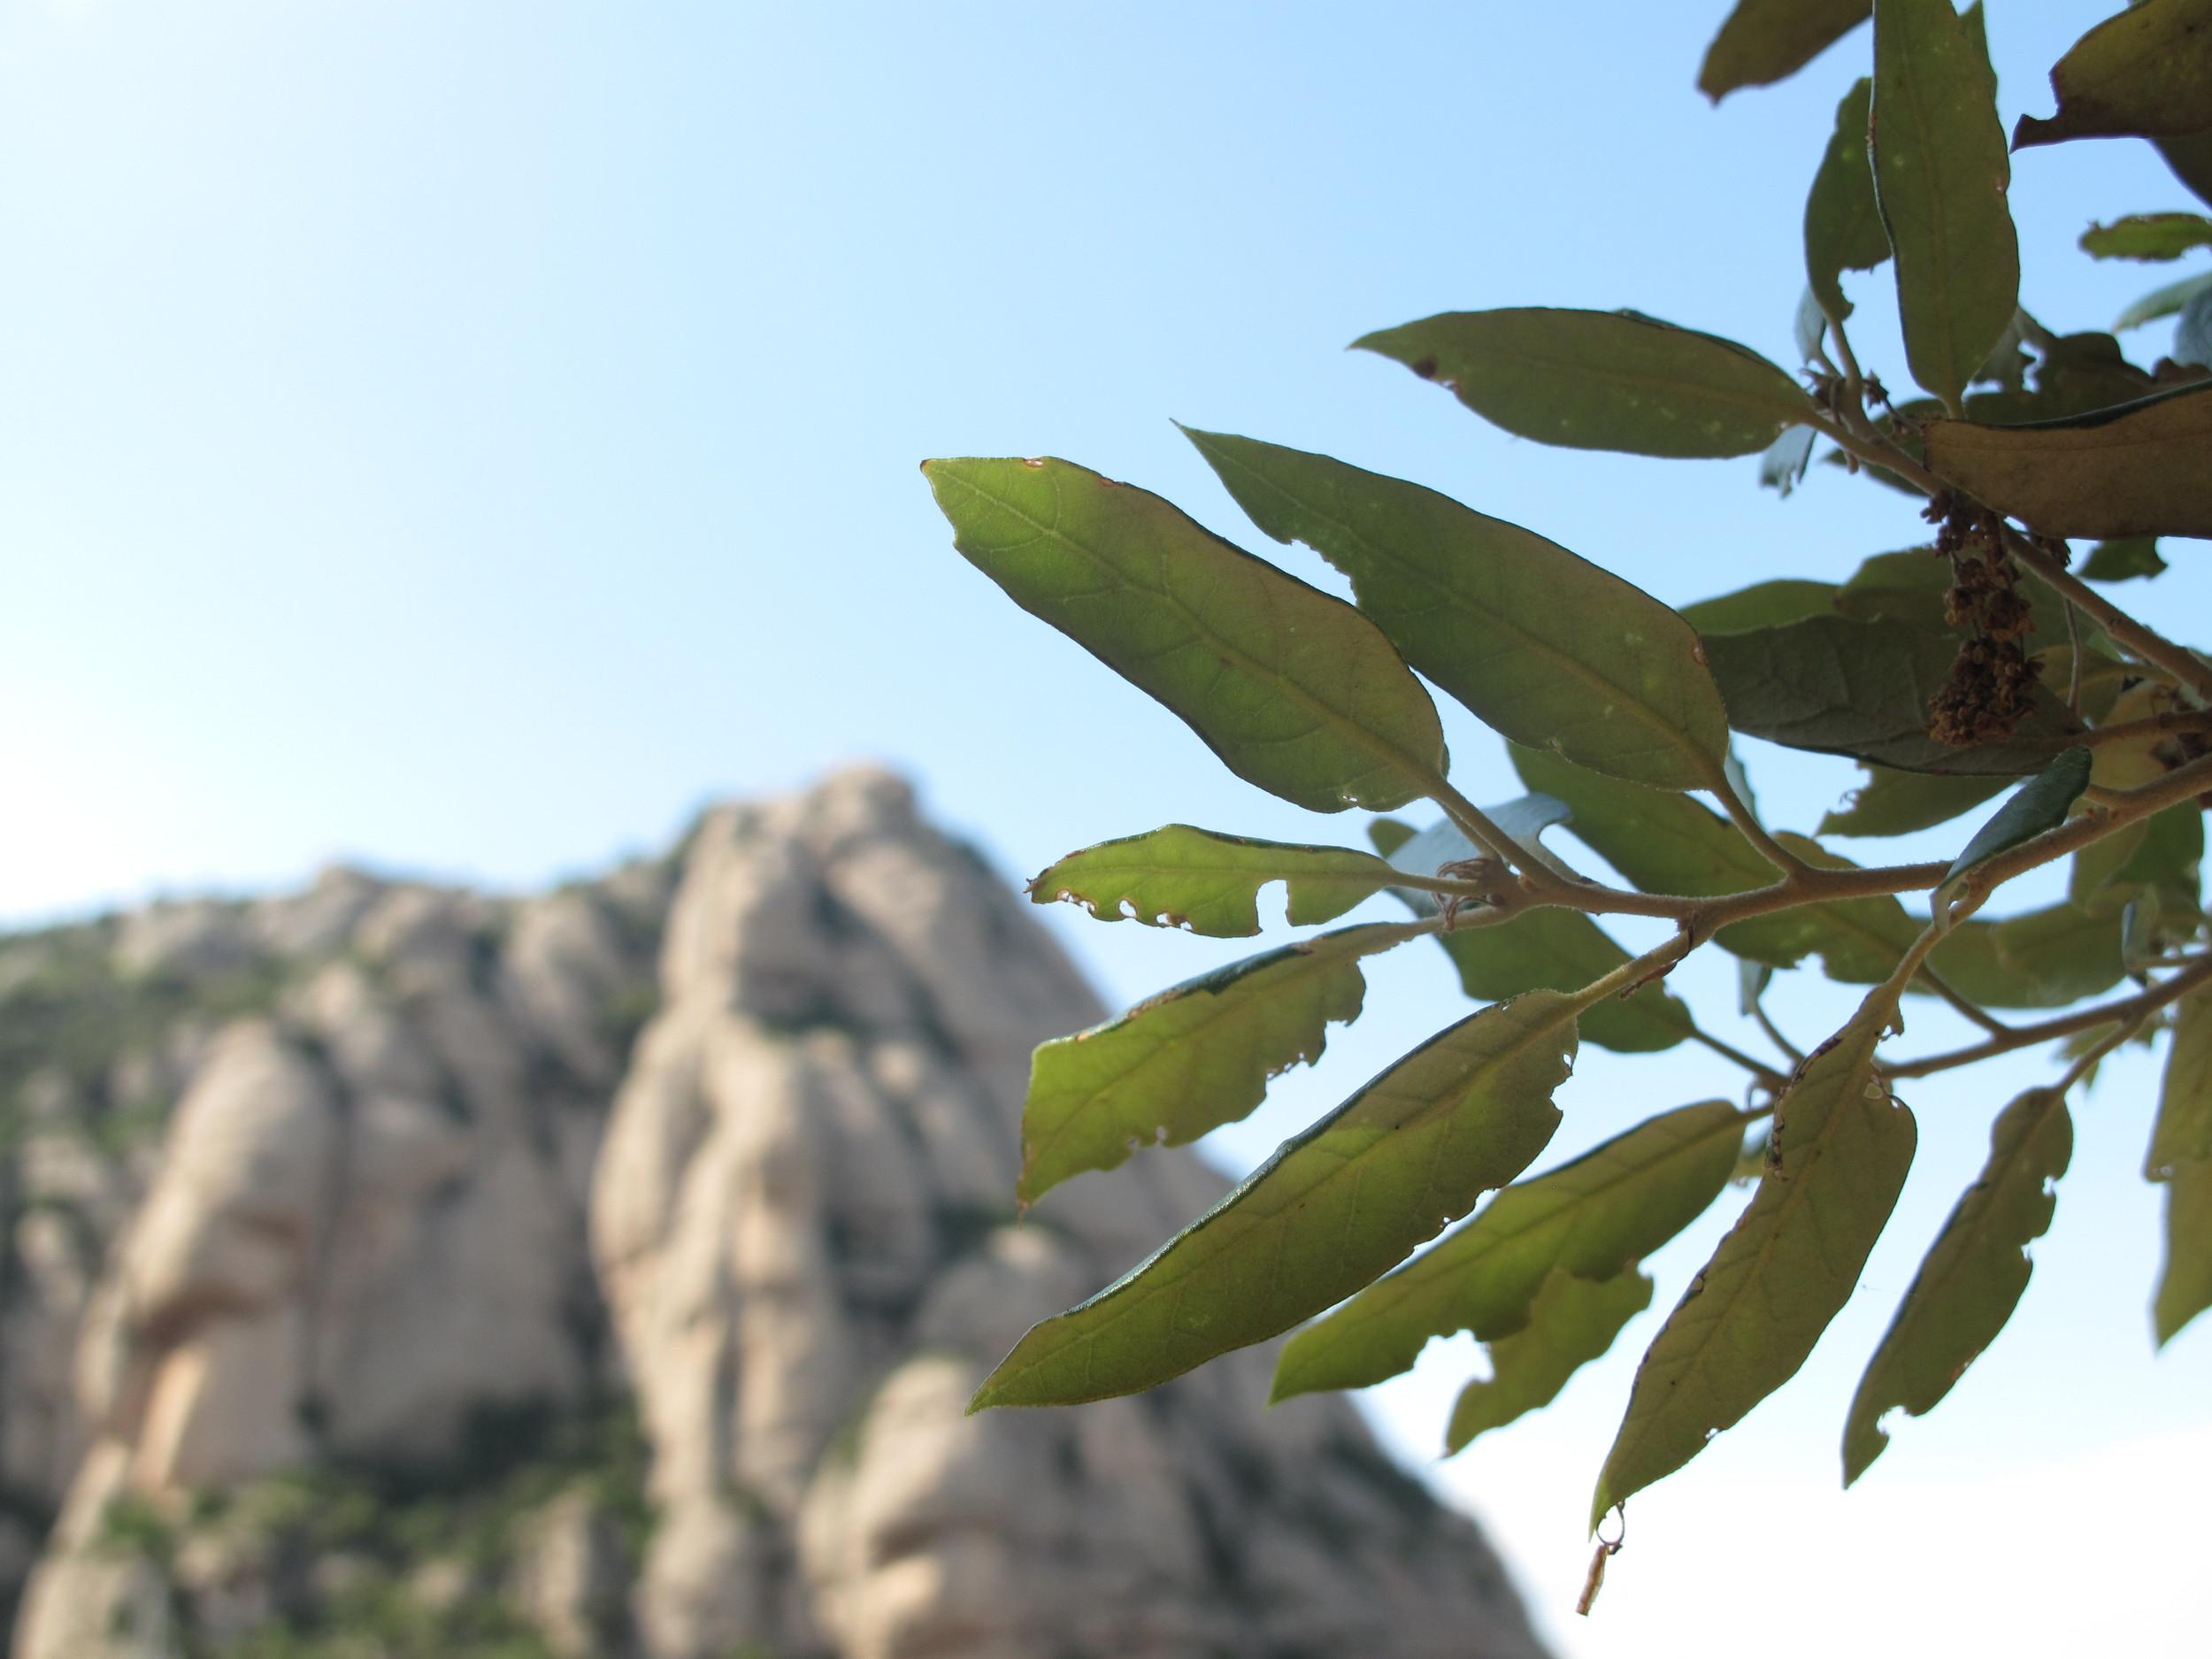 Montserrat mountains and eucalyptus leaves